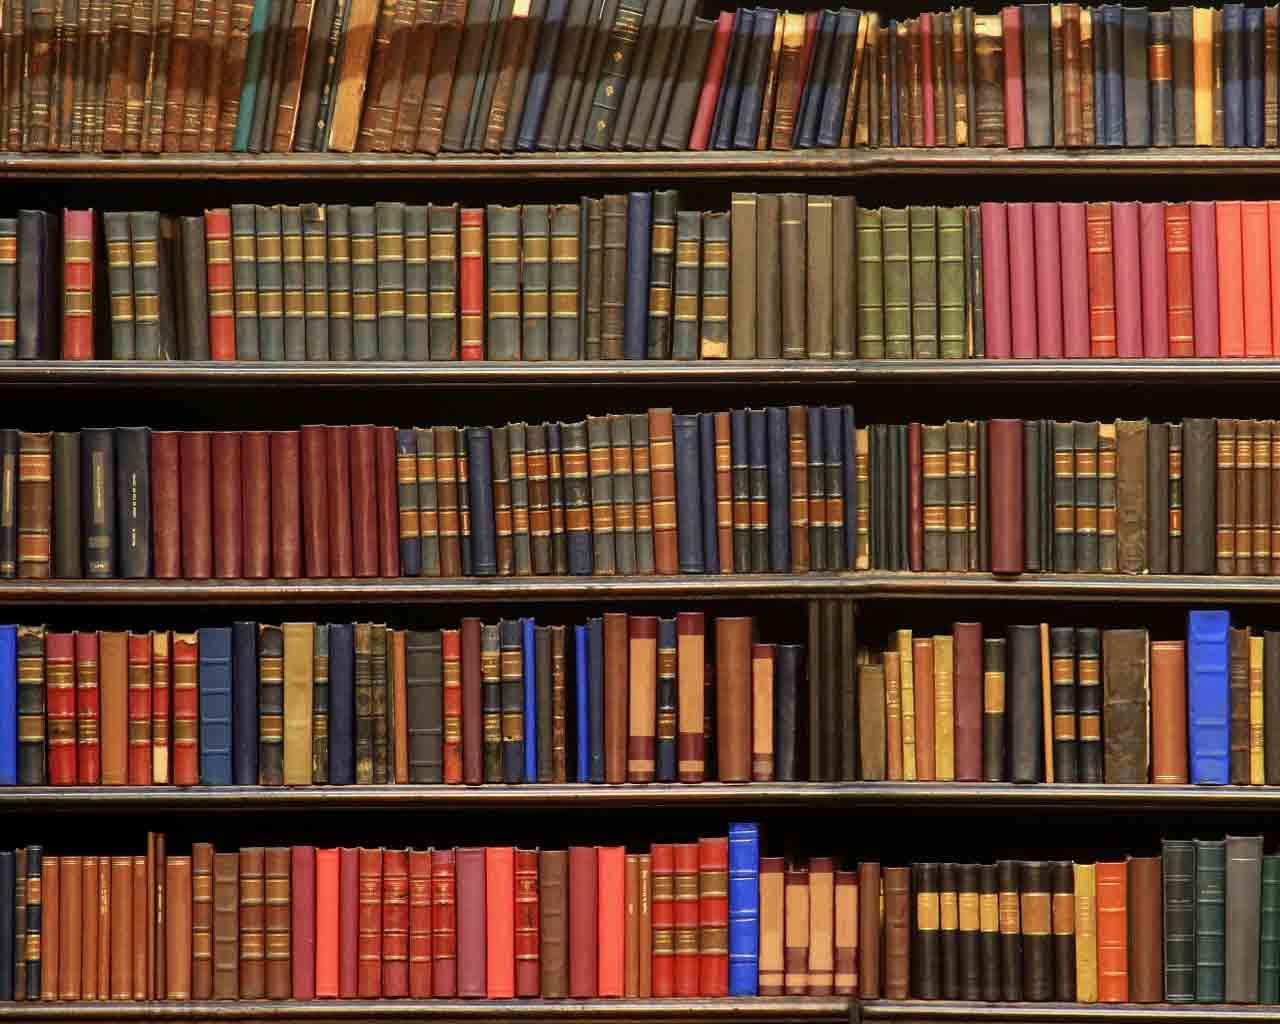 desktop wallpaper library theme - wallpapersafari